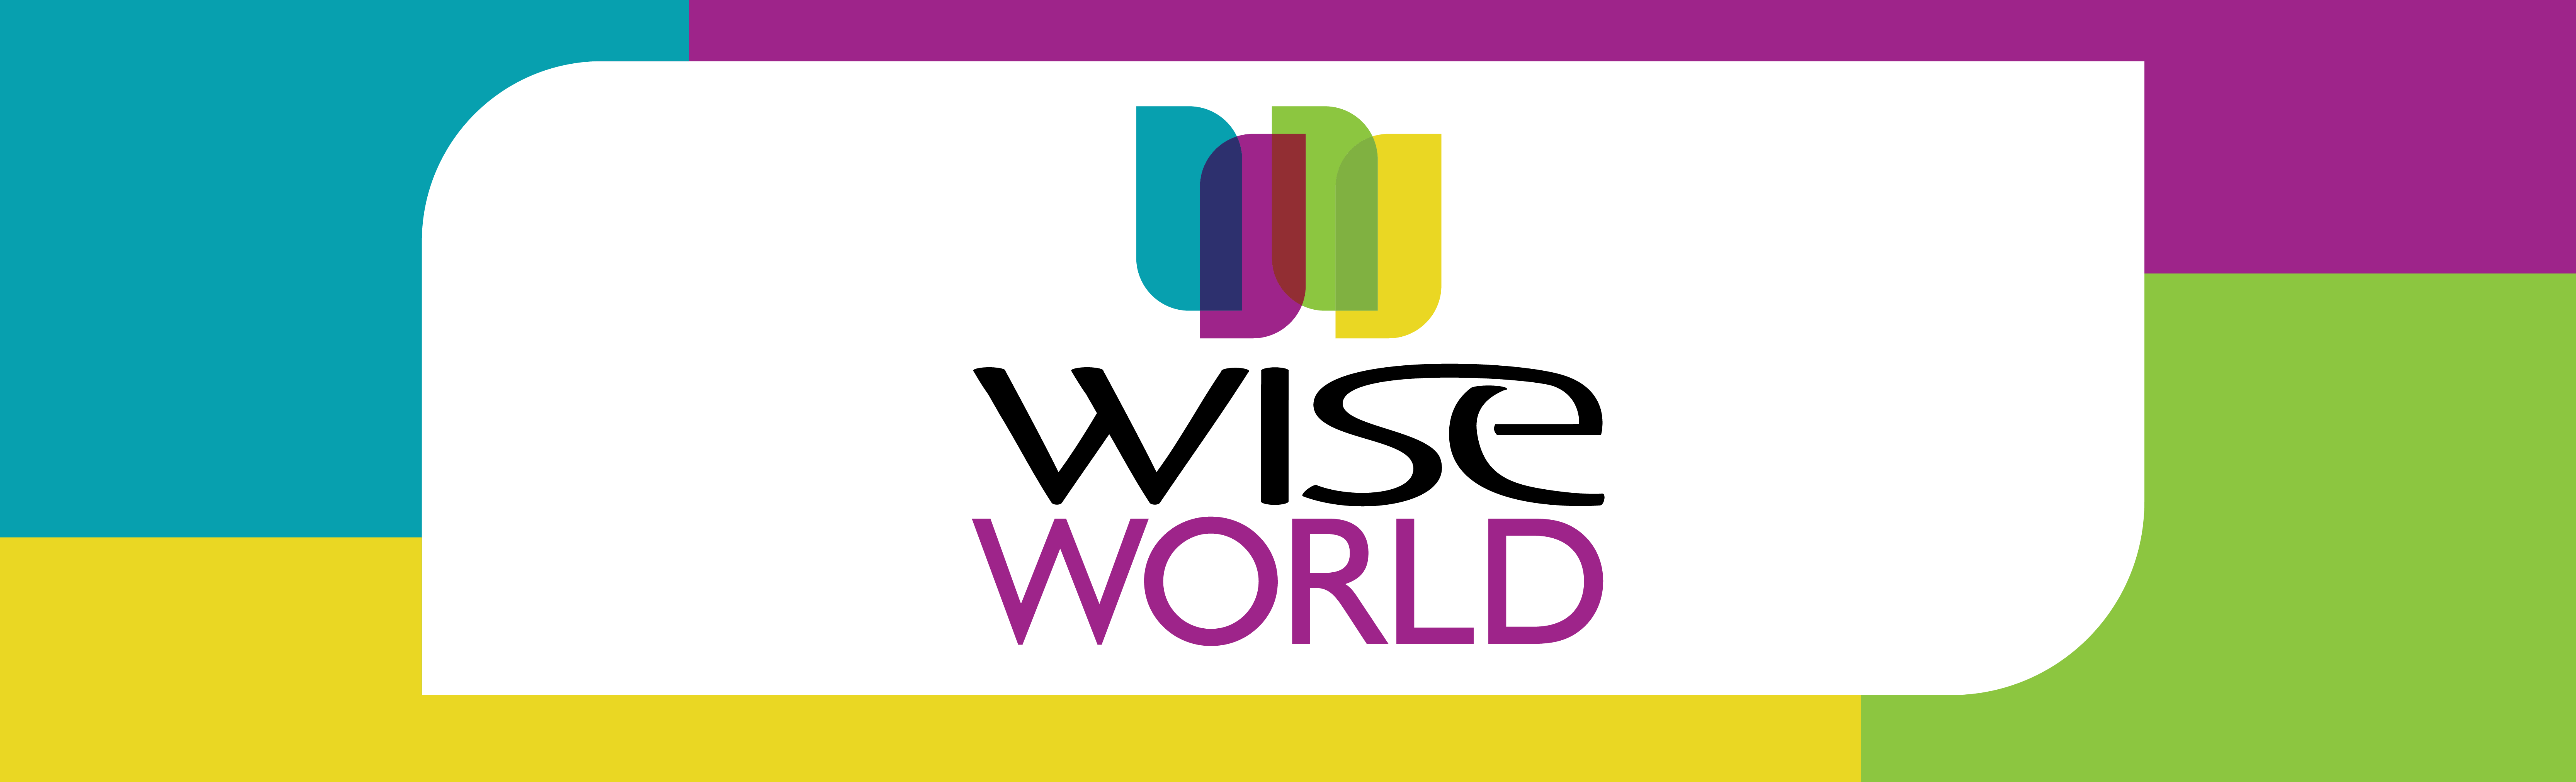 2021 WISE Web Headers WORLD